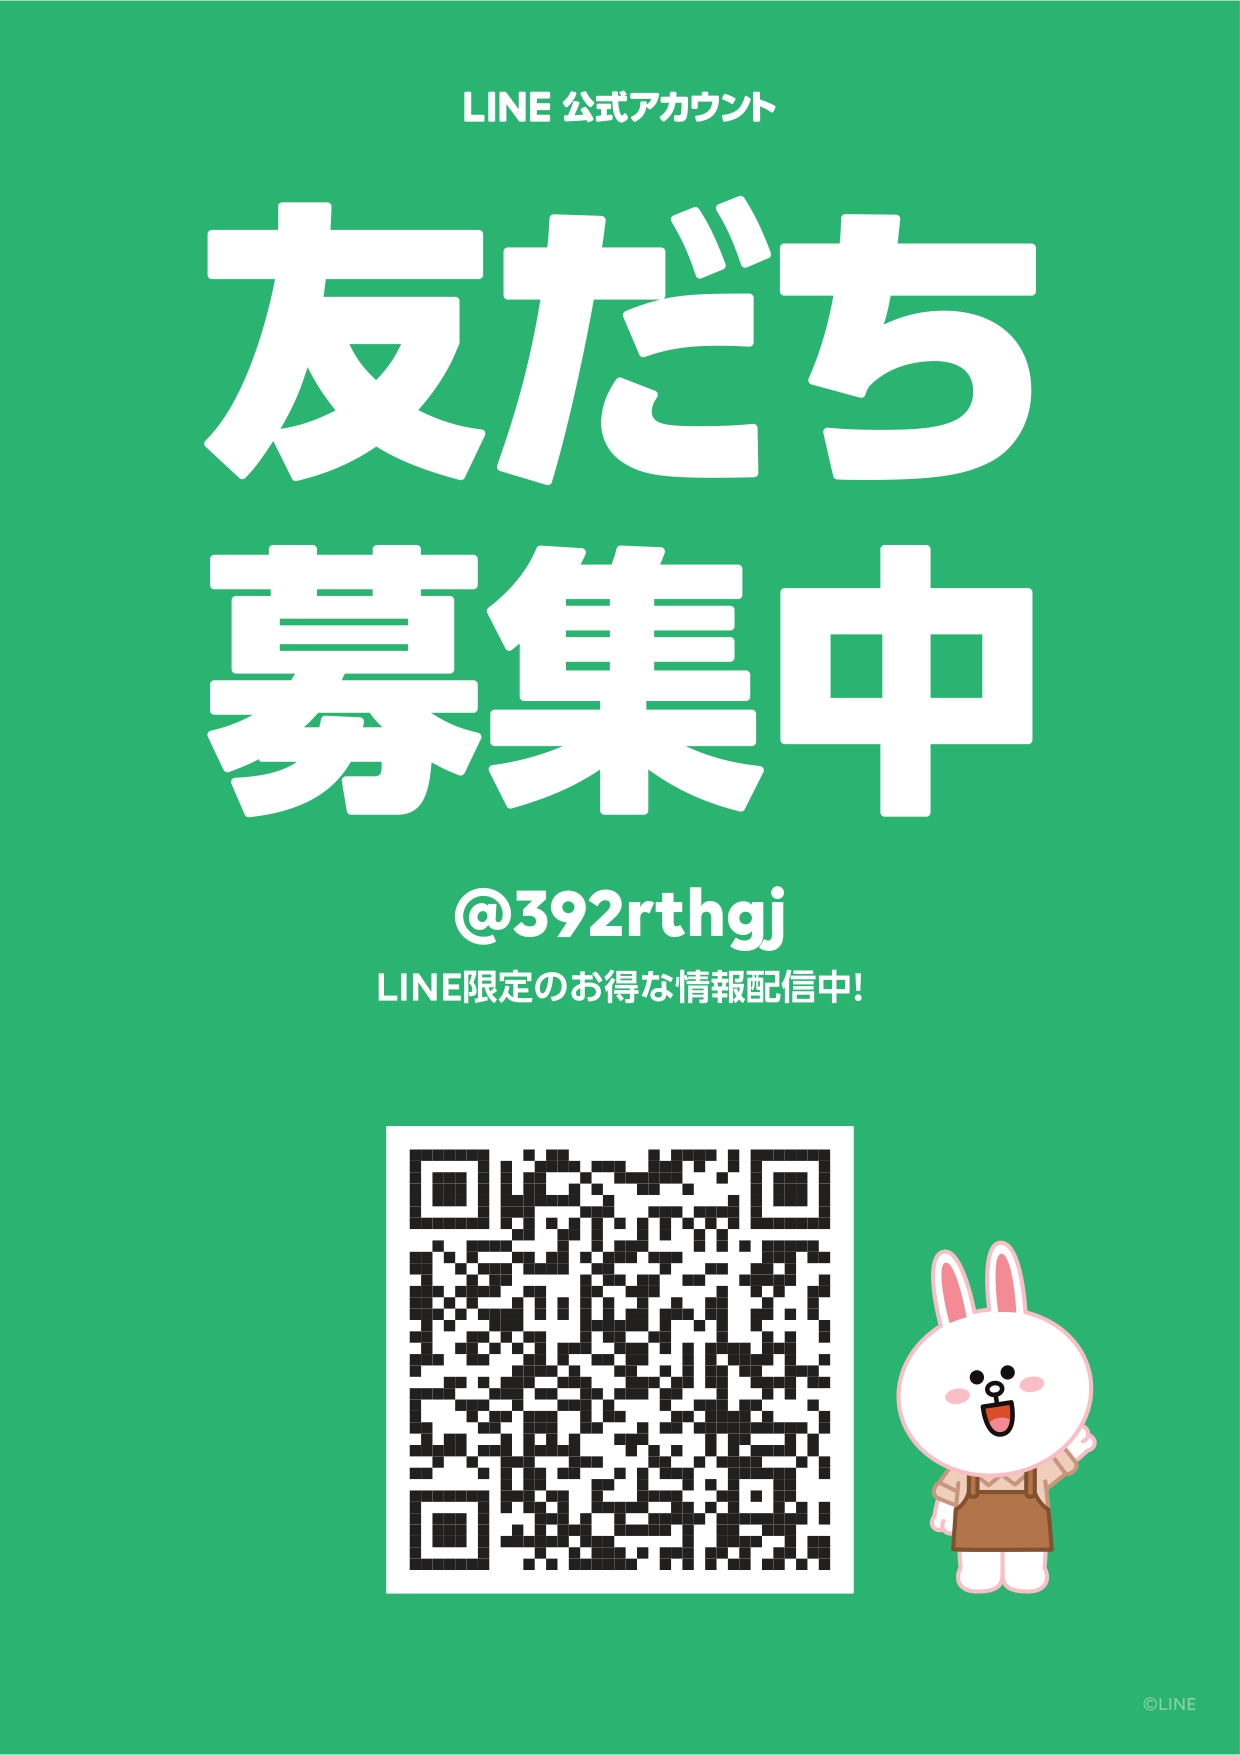 友達募集中_page-0001.jpg